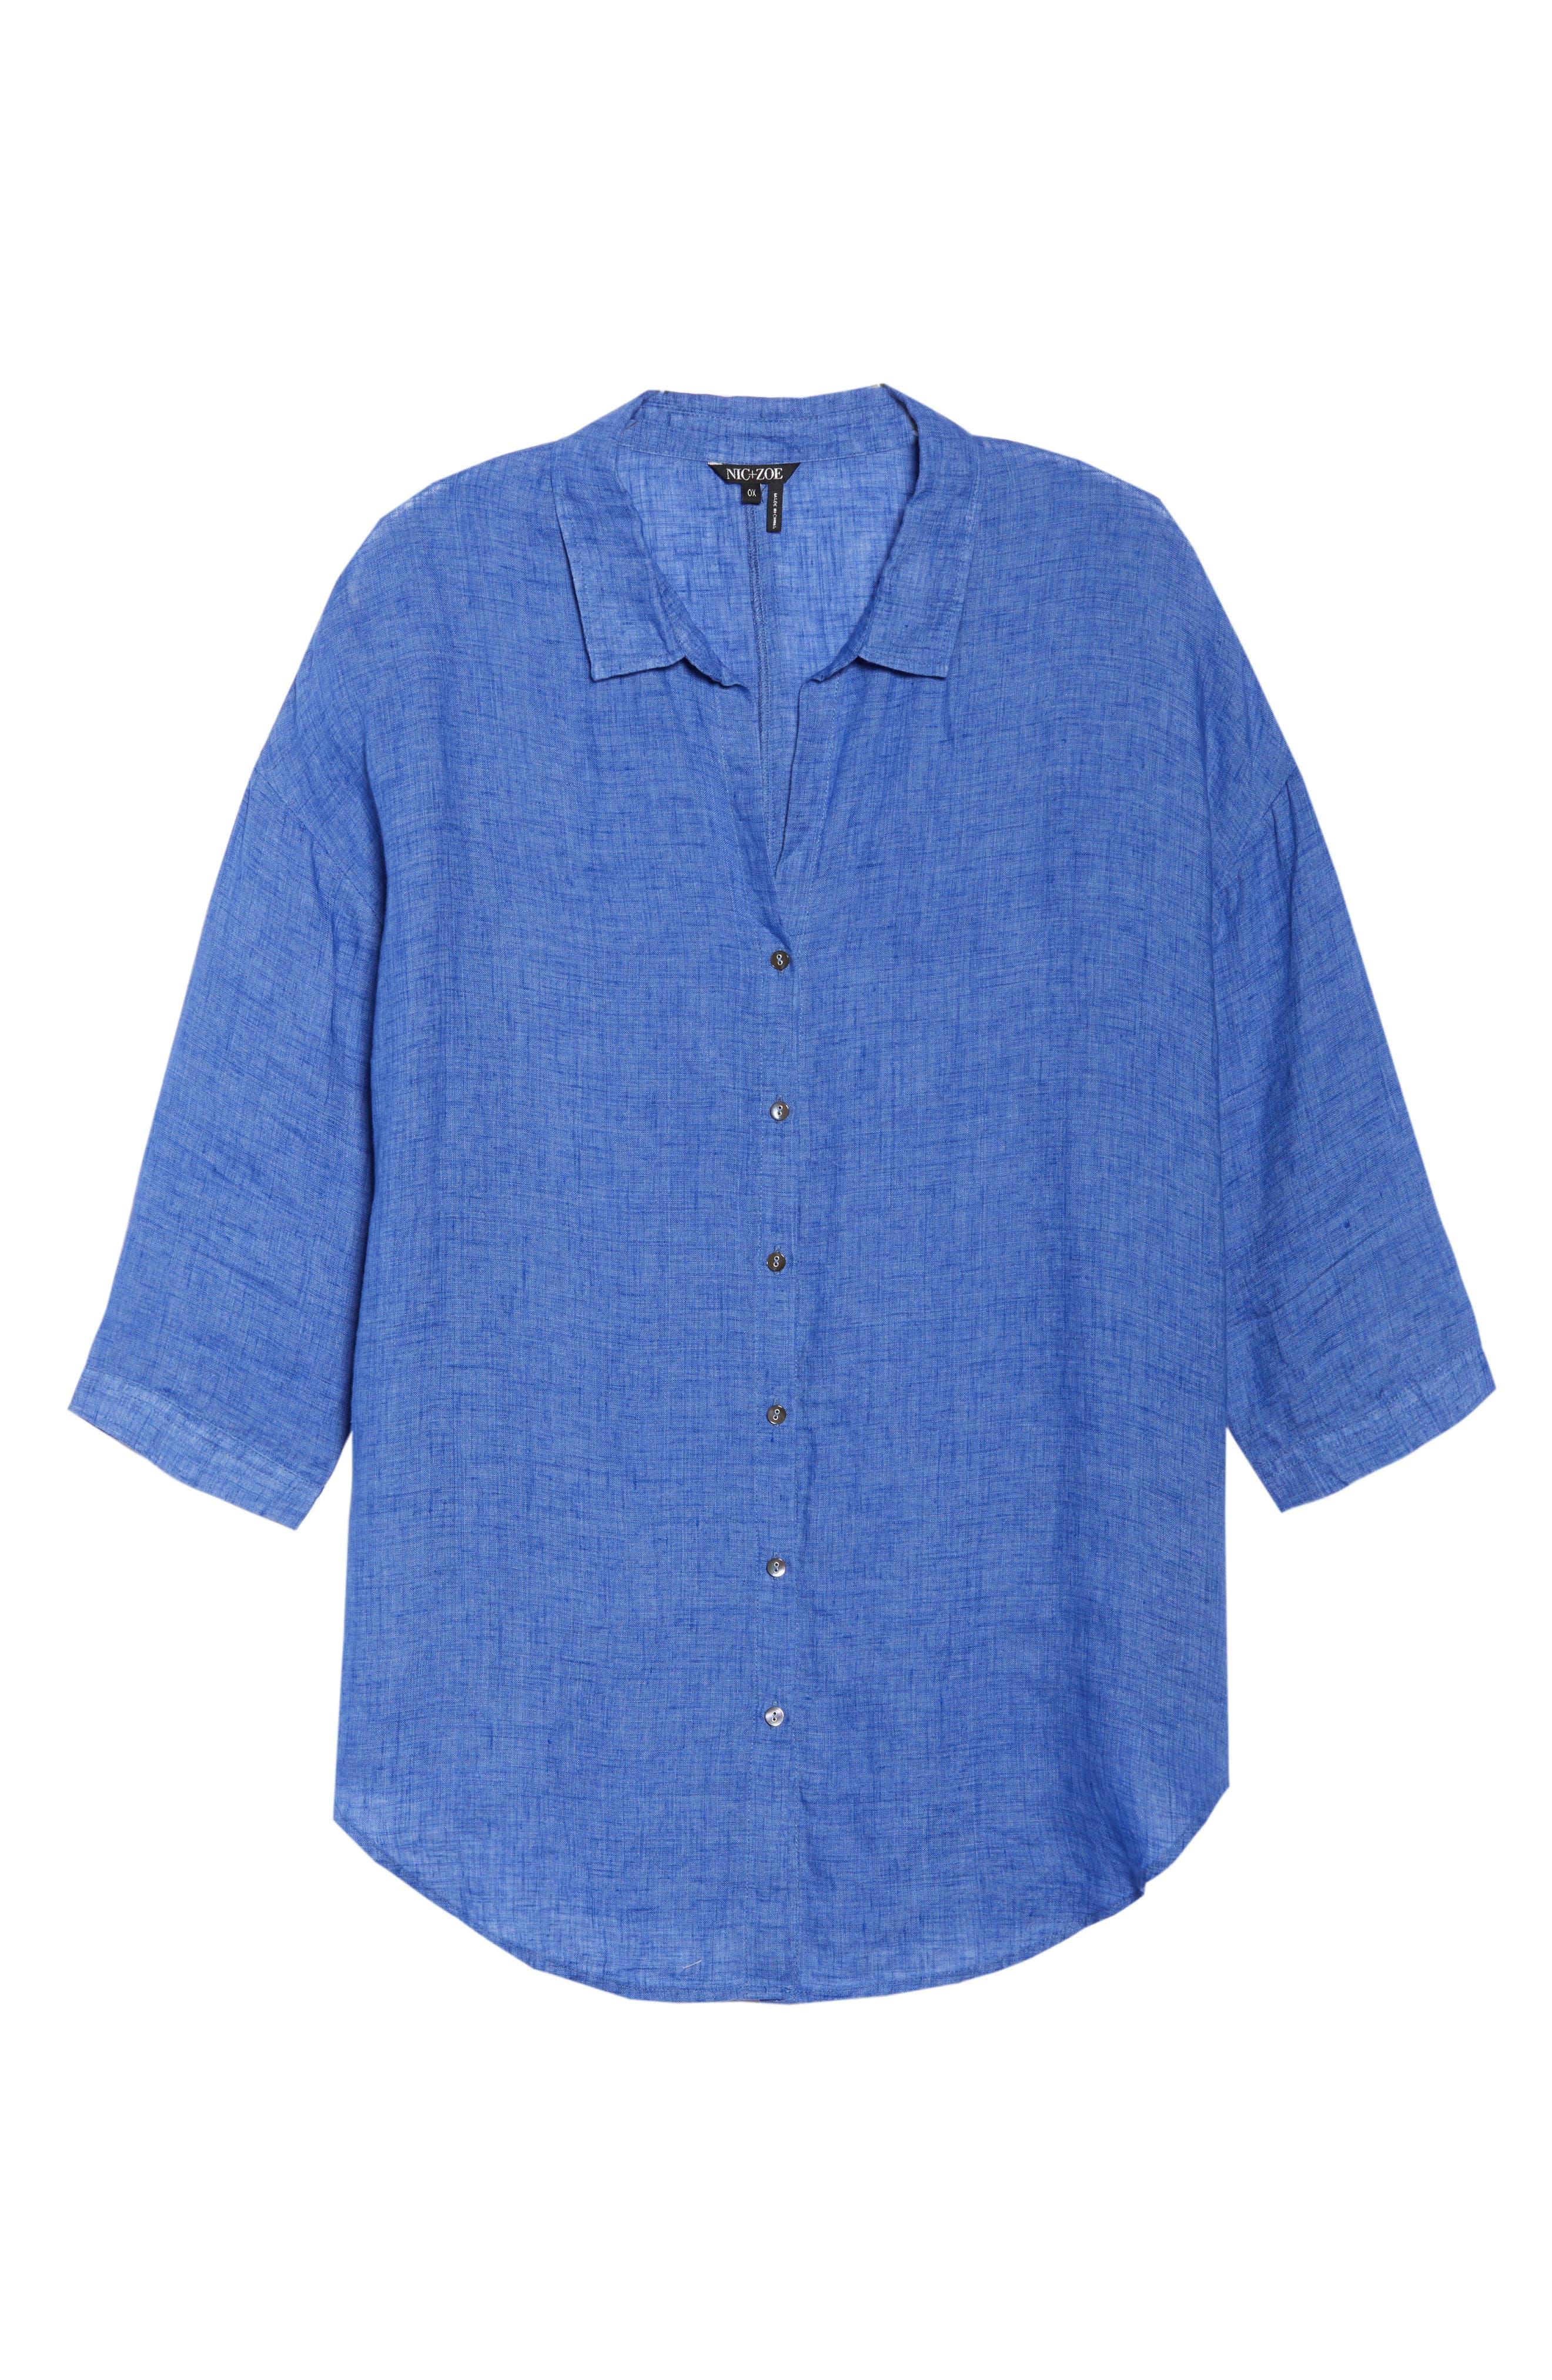 Joy Ride Linen Tunic Top,                             Alternate thumbnail 7, color,